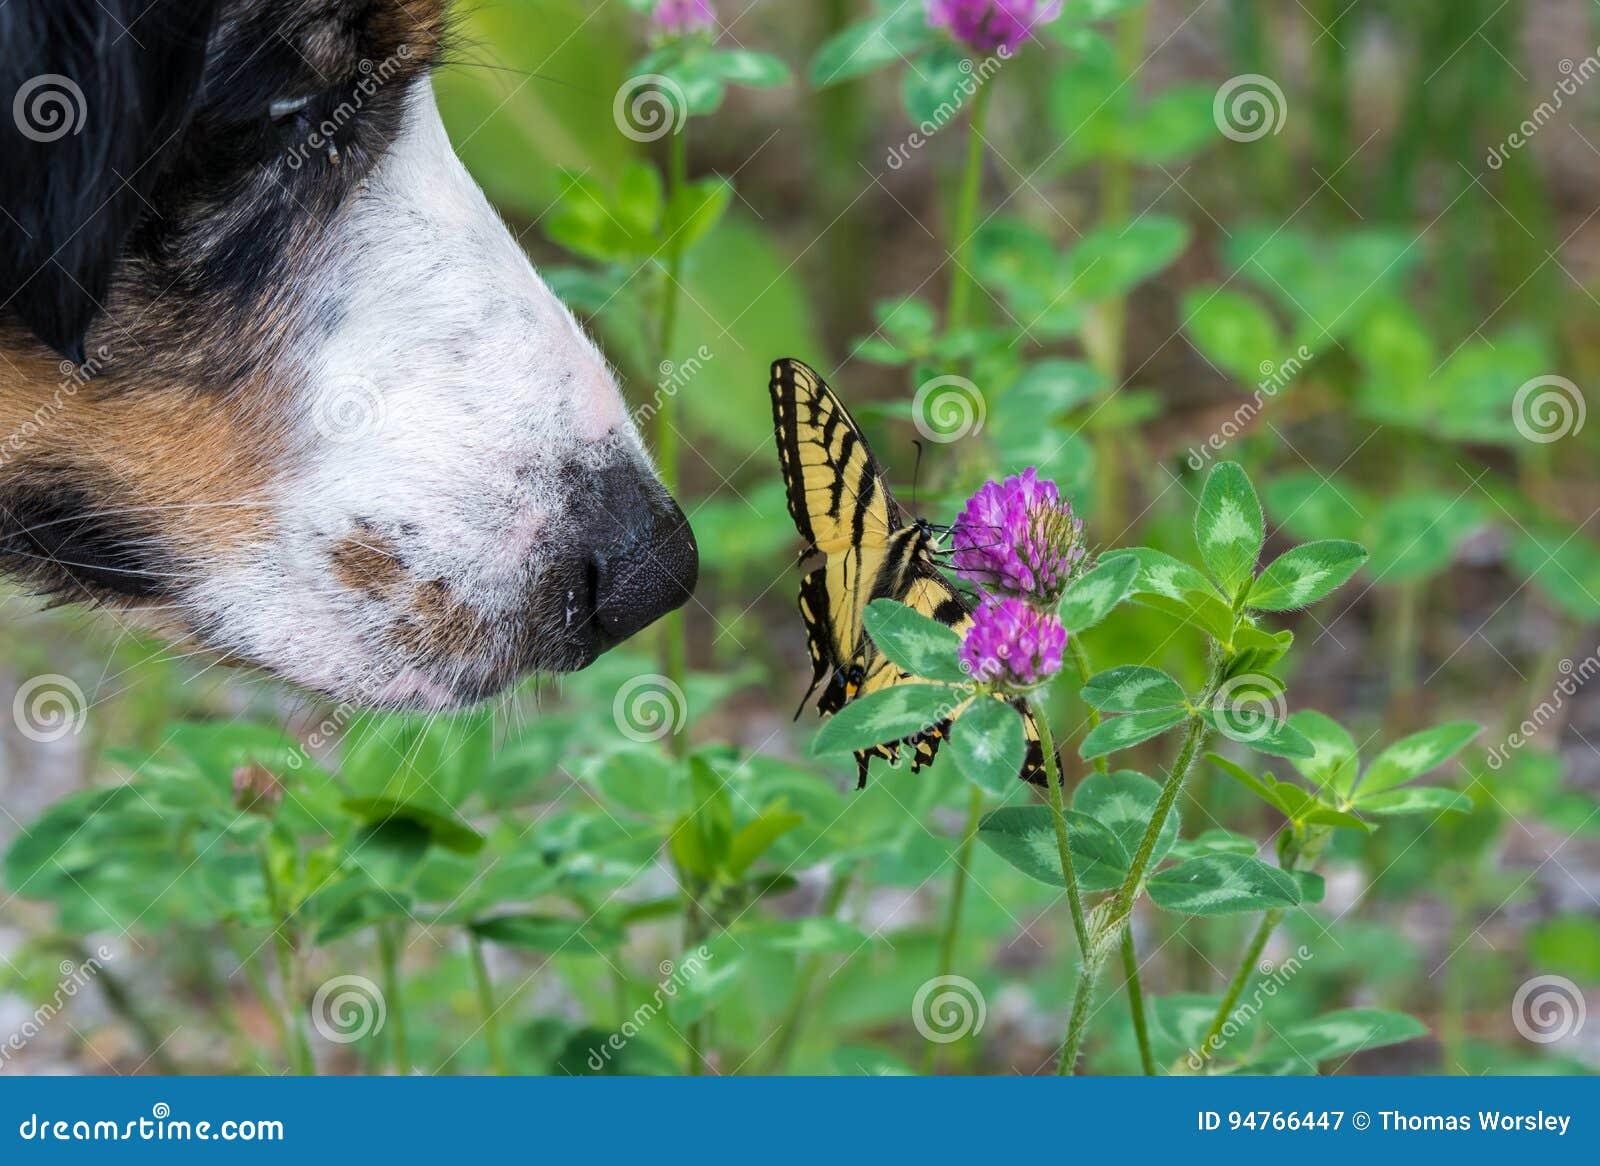 Cane e farfalla